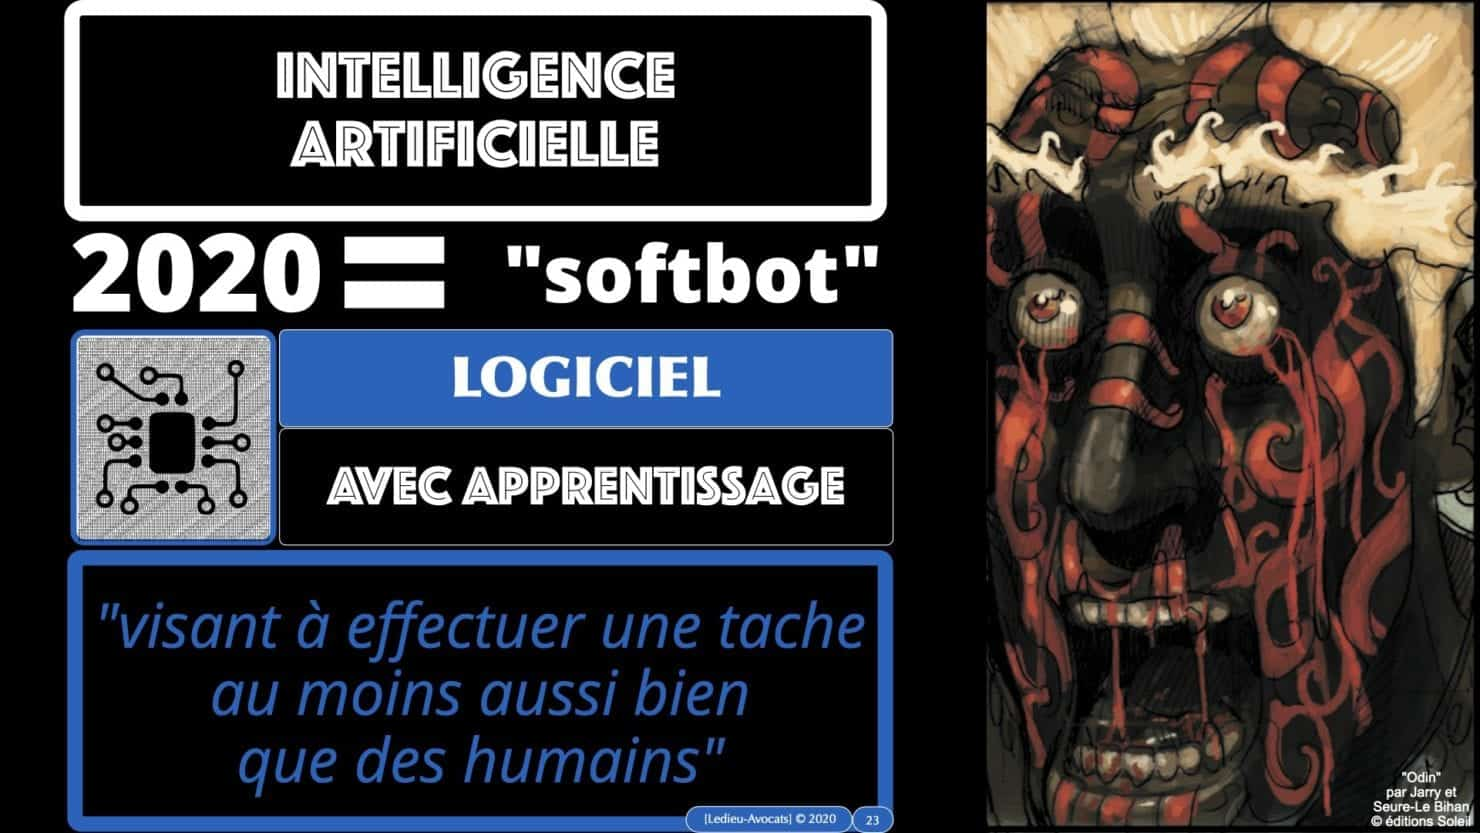 Intelligence artificielle softbot